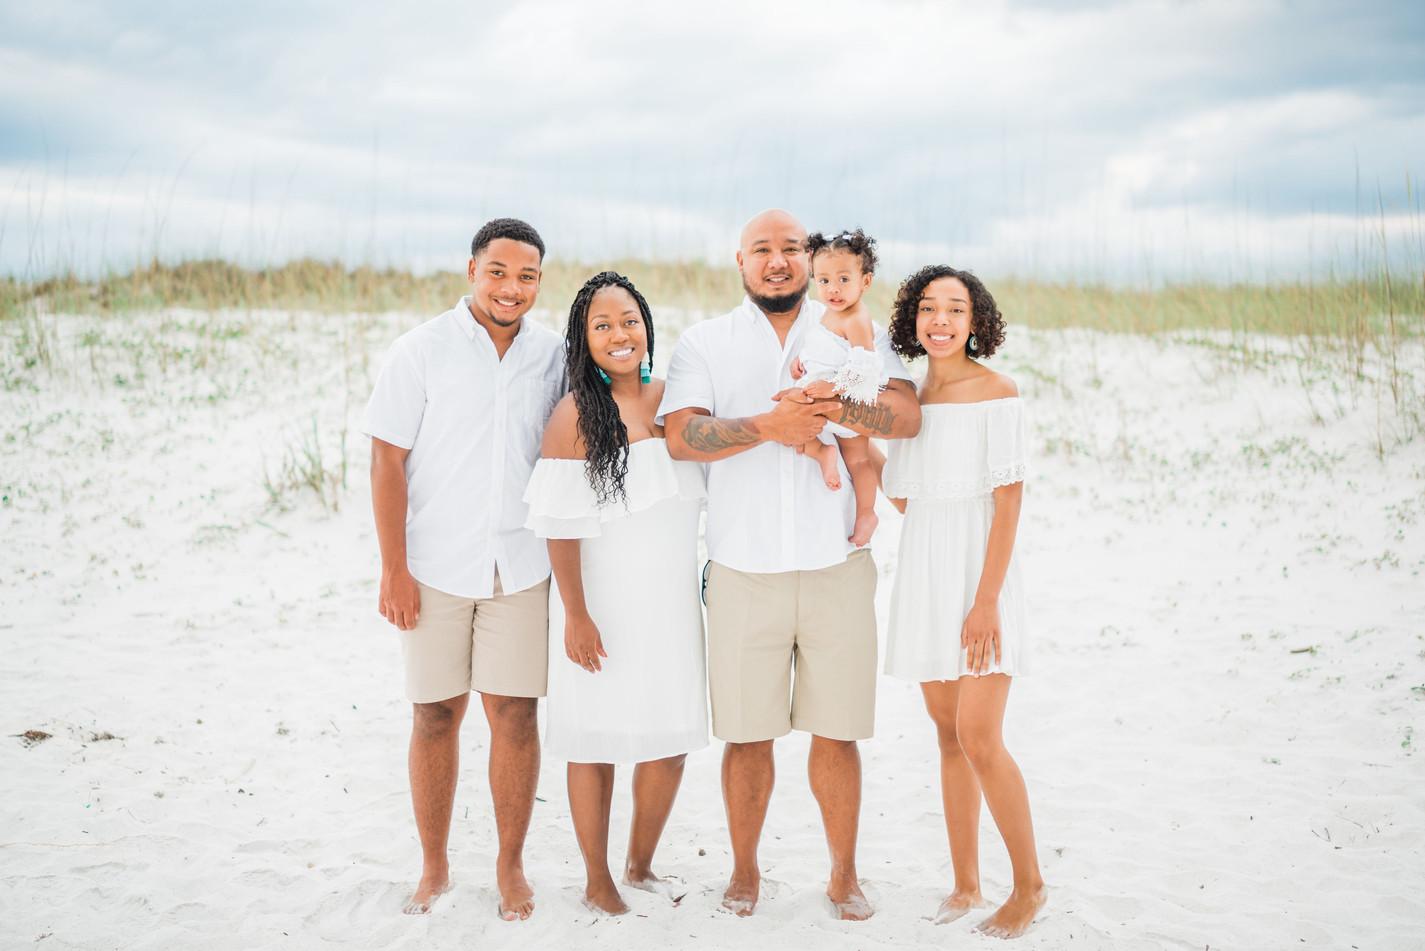 thereyesfamily-1.jpg